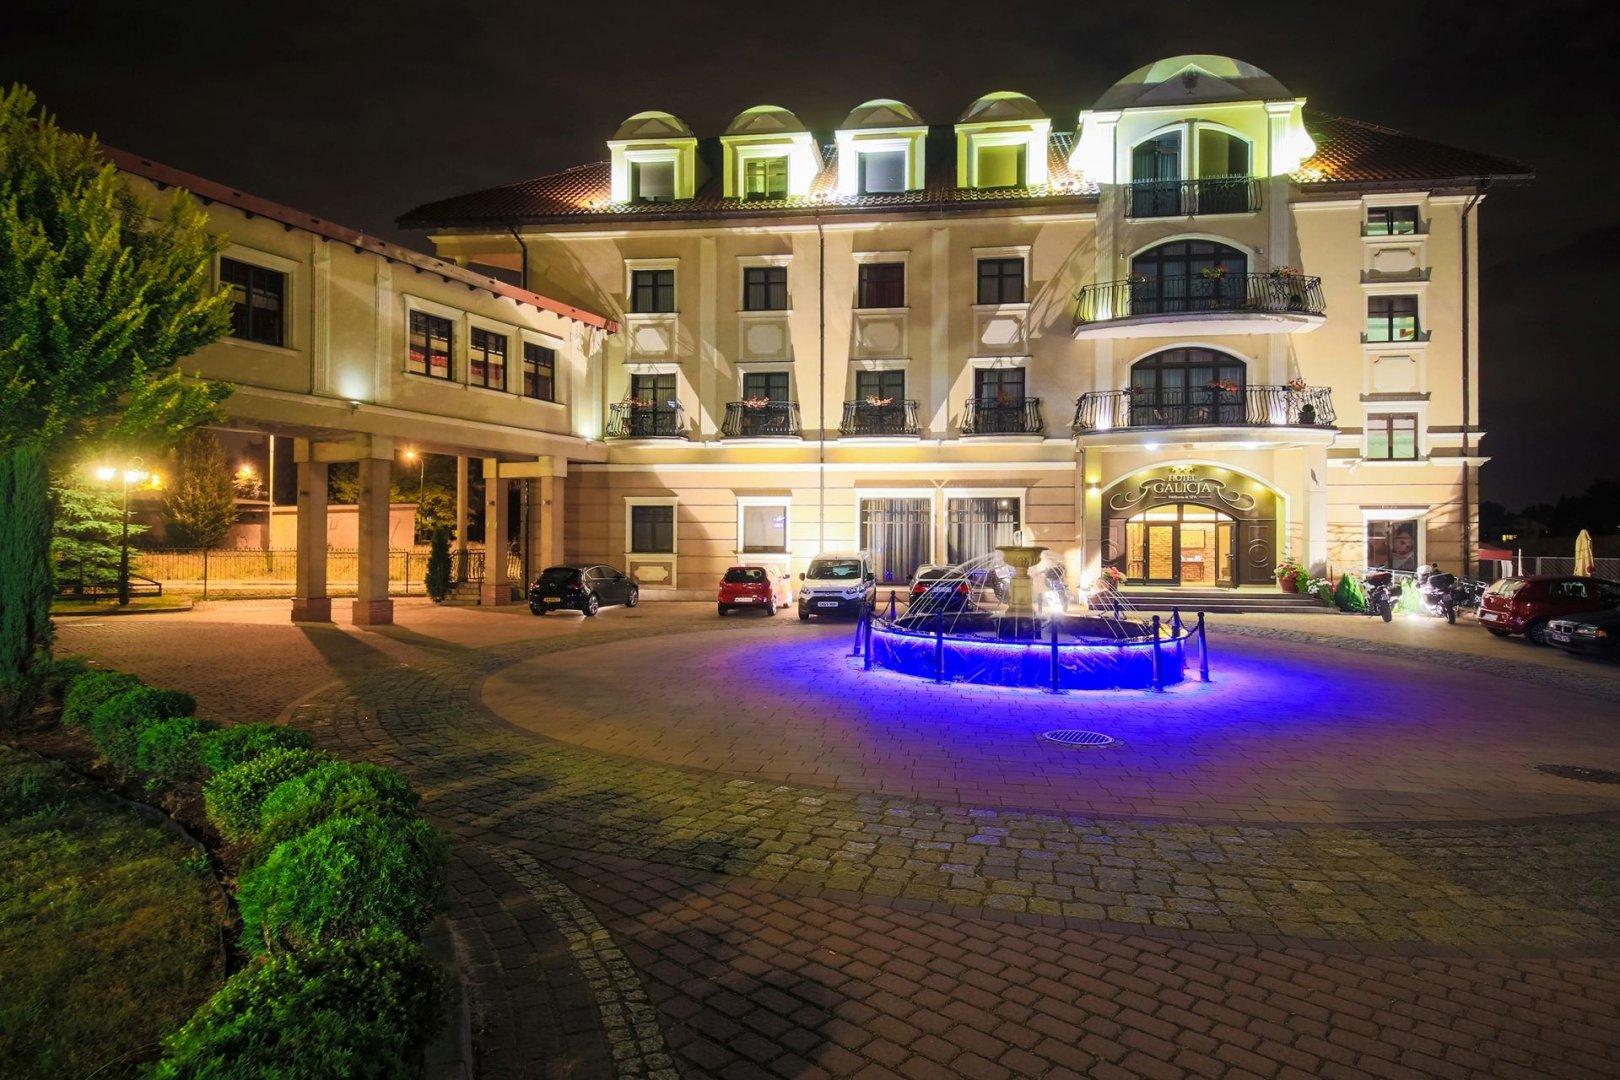 Galicja Wellness & SPA Hotel